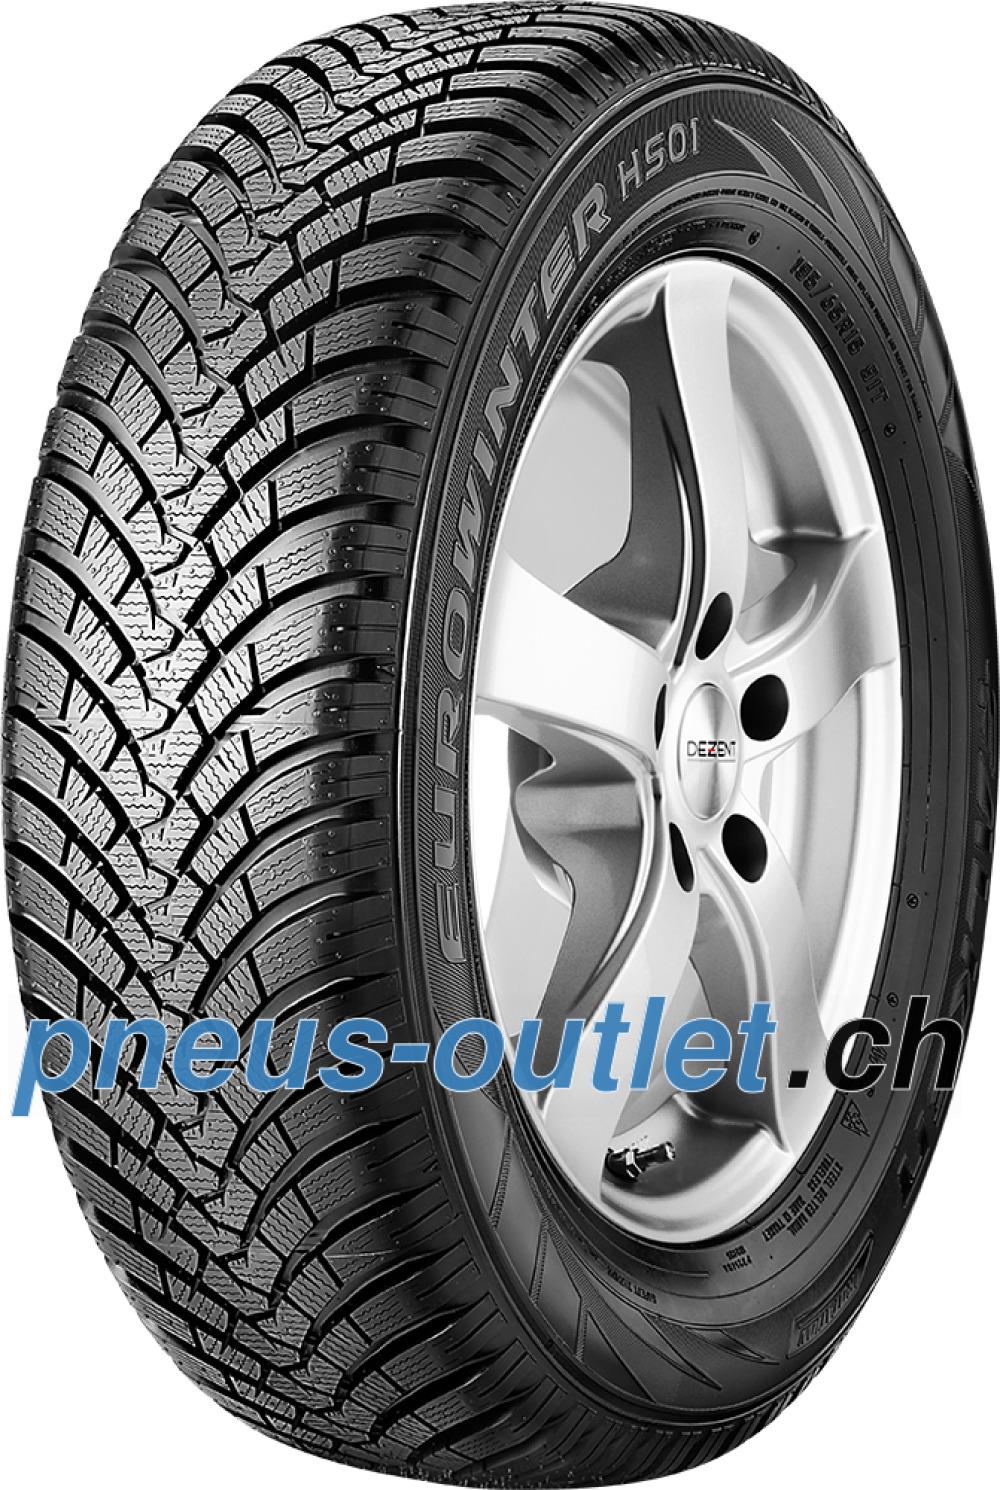 Falken Eurowinter HS01 ( 225/55 R19 99H , SUV )